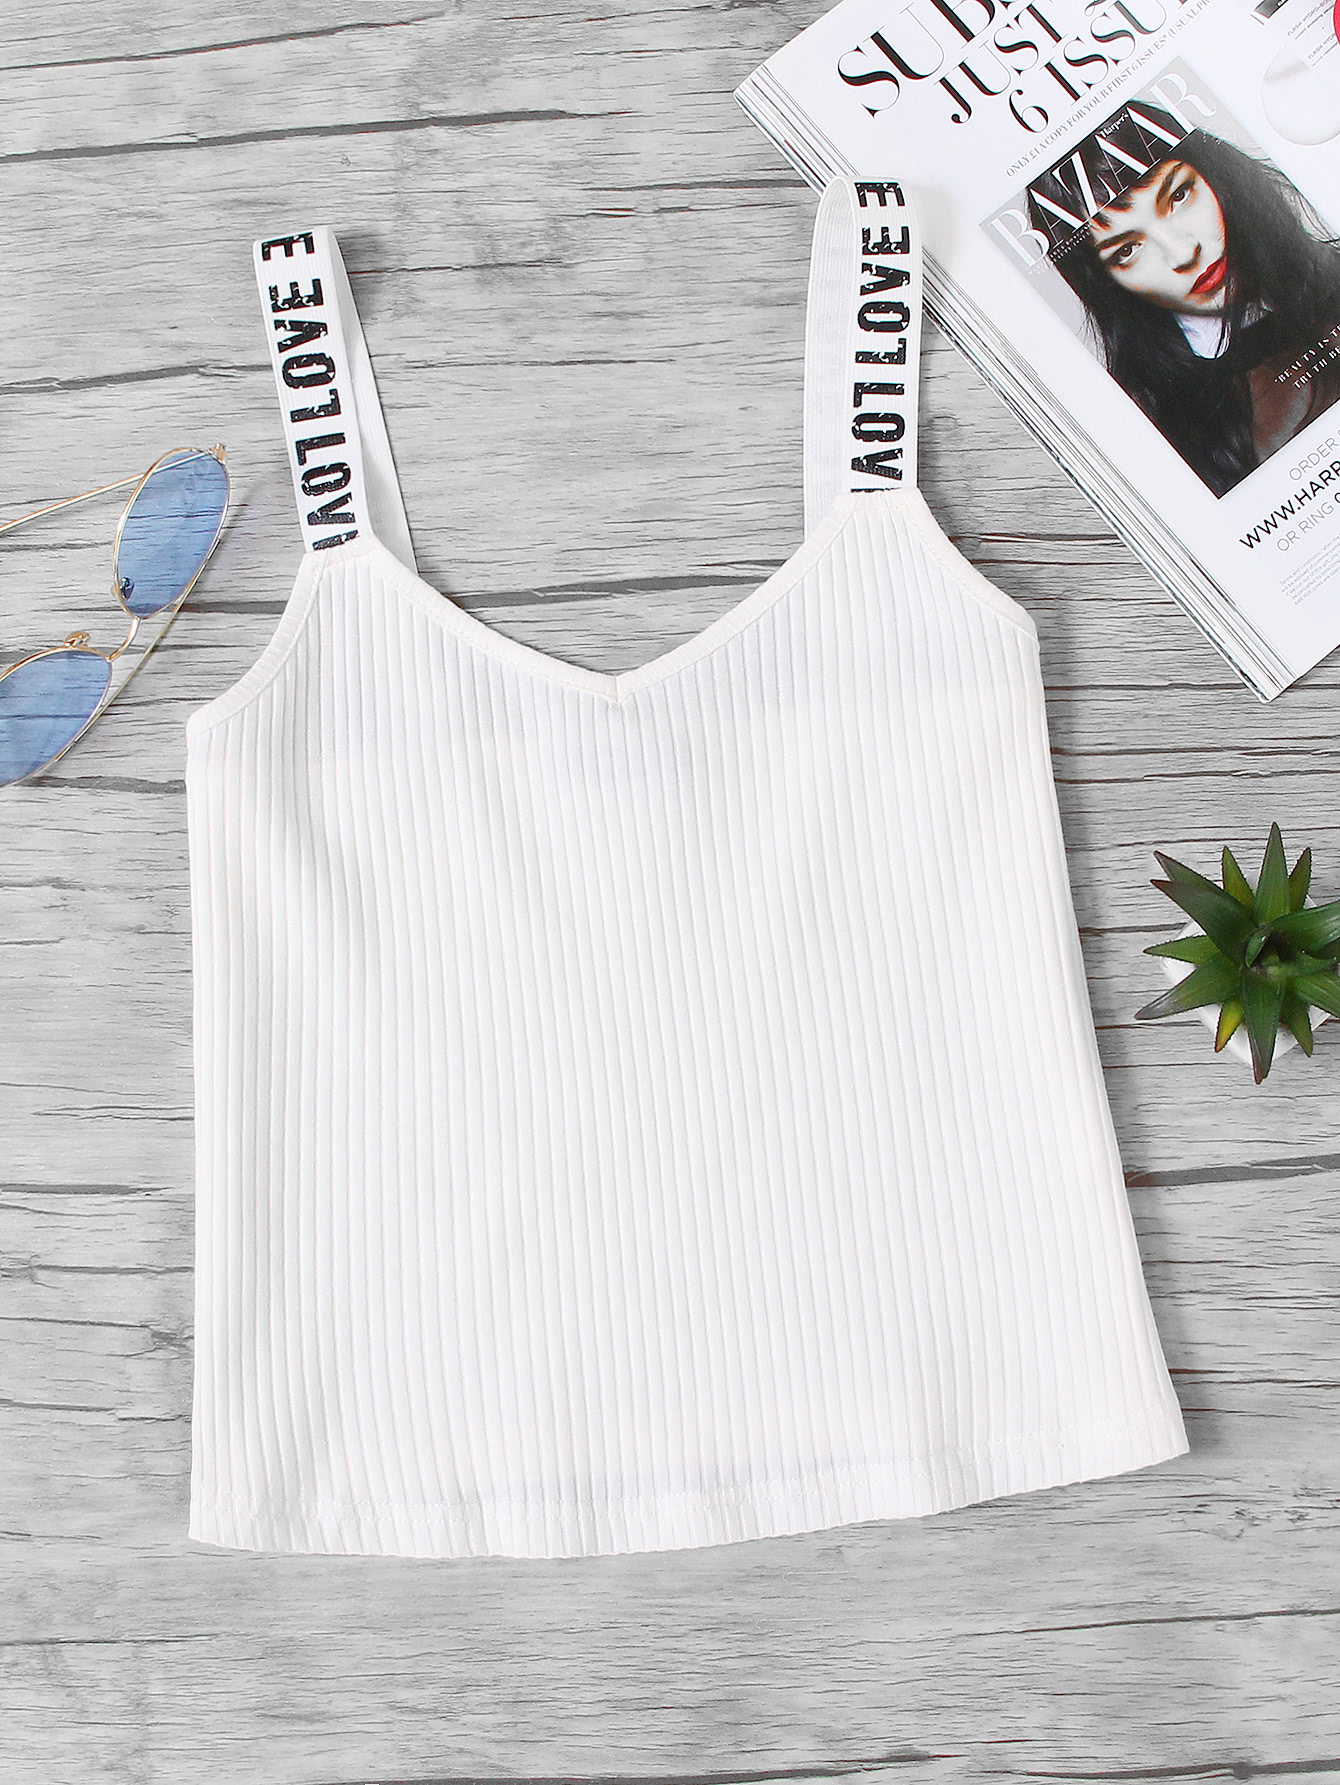 Rib Knit Printed Thick Strap Cami Top vest170930702